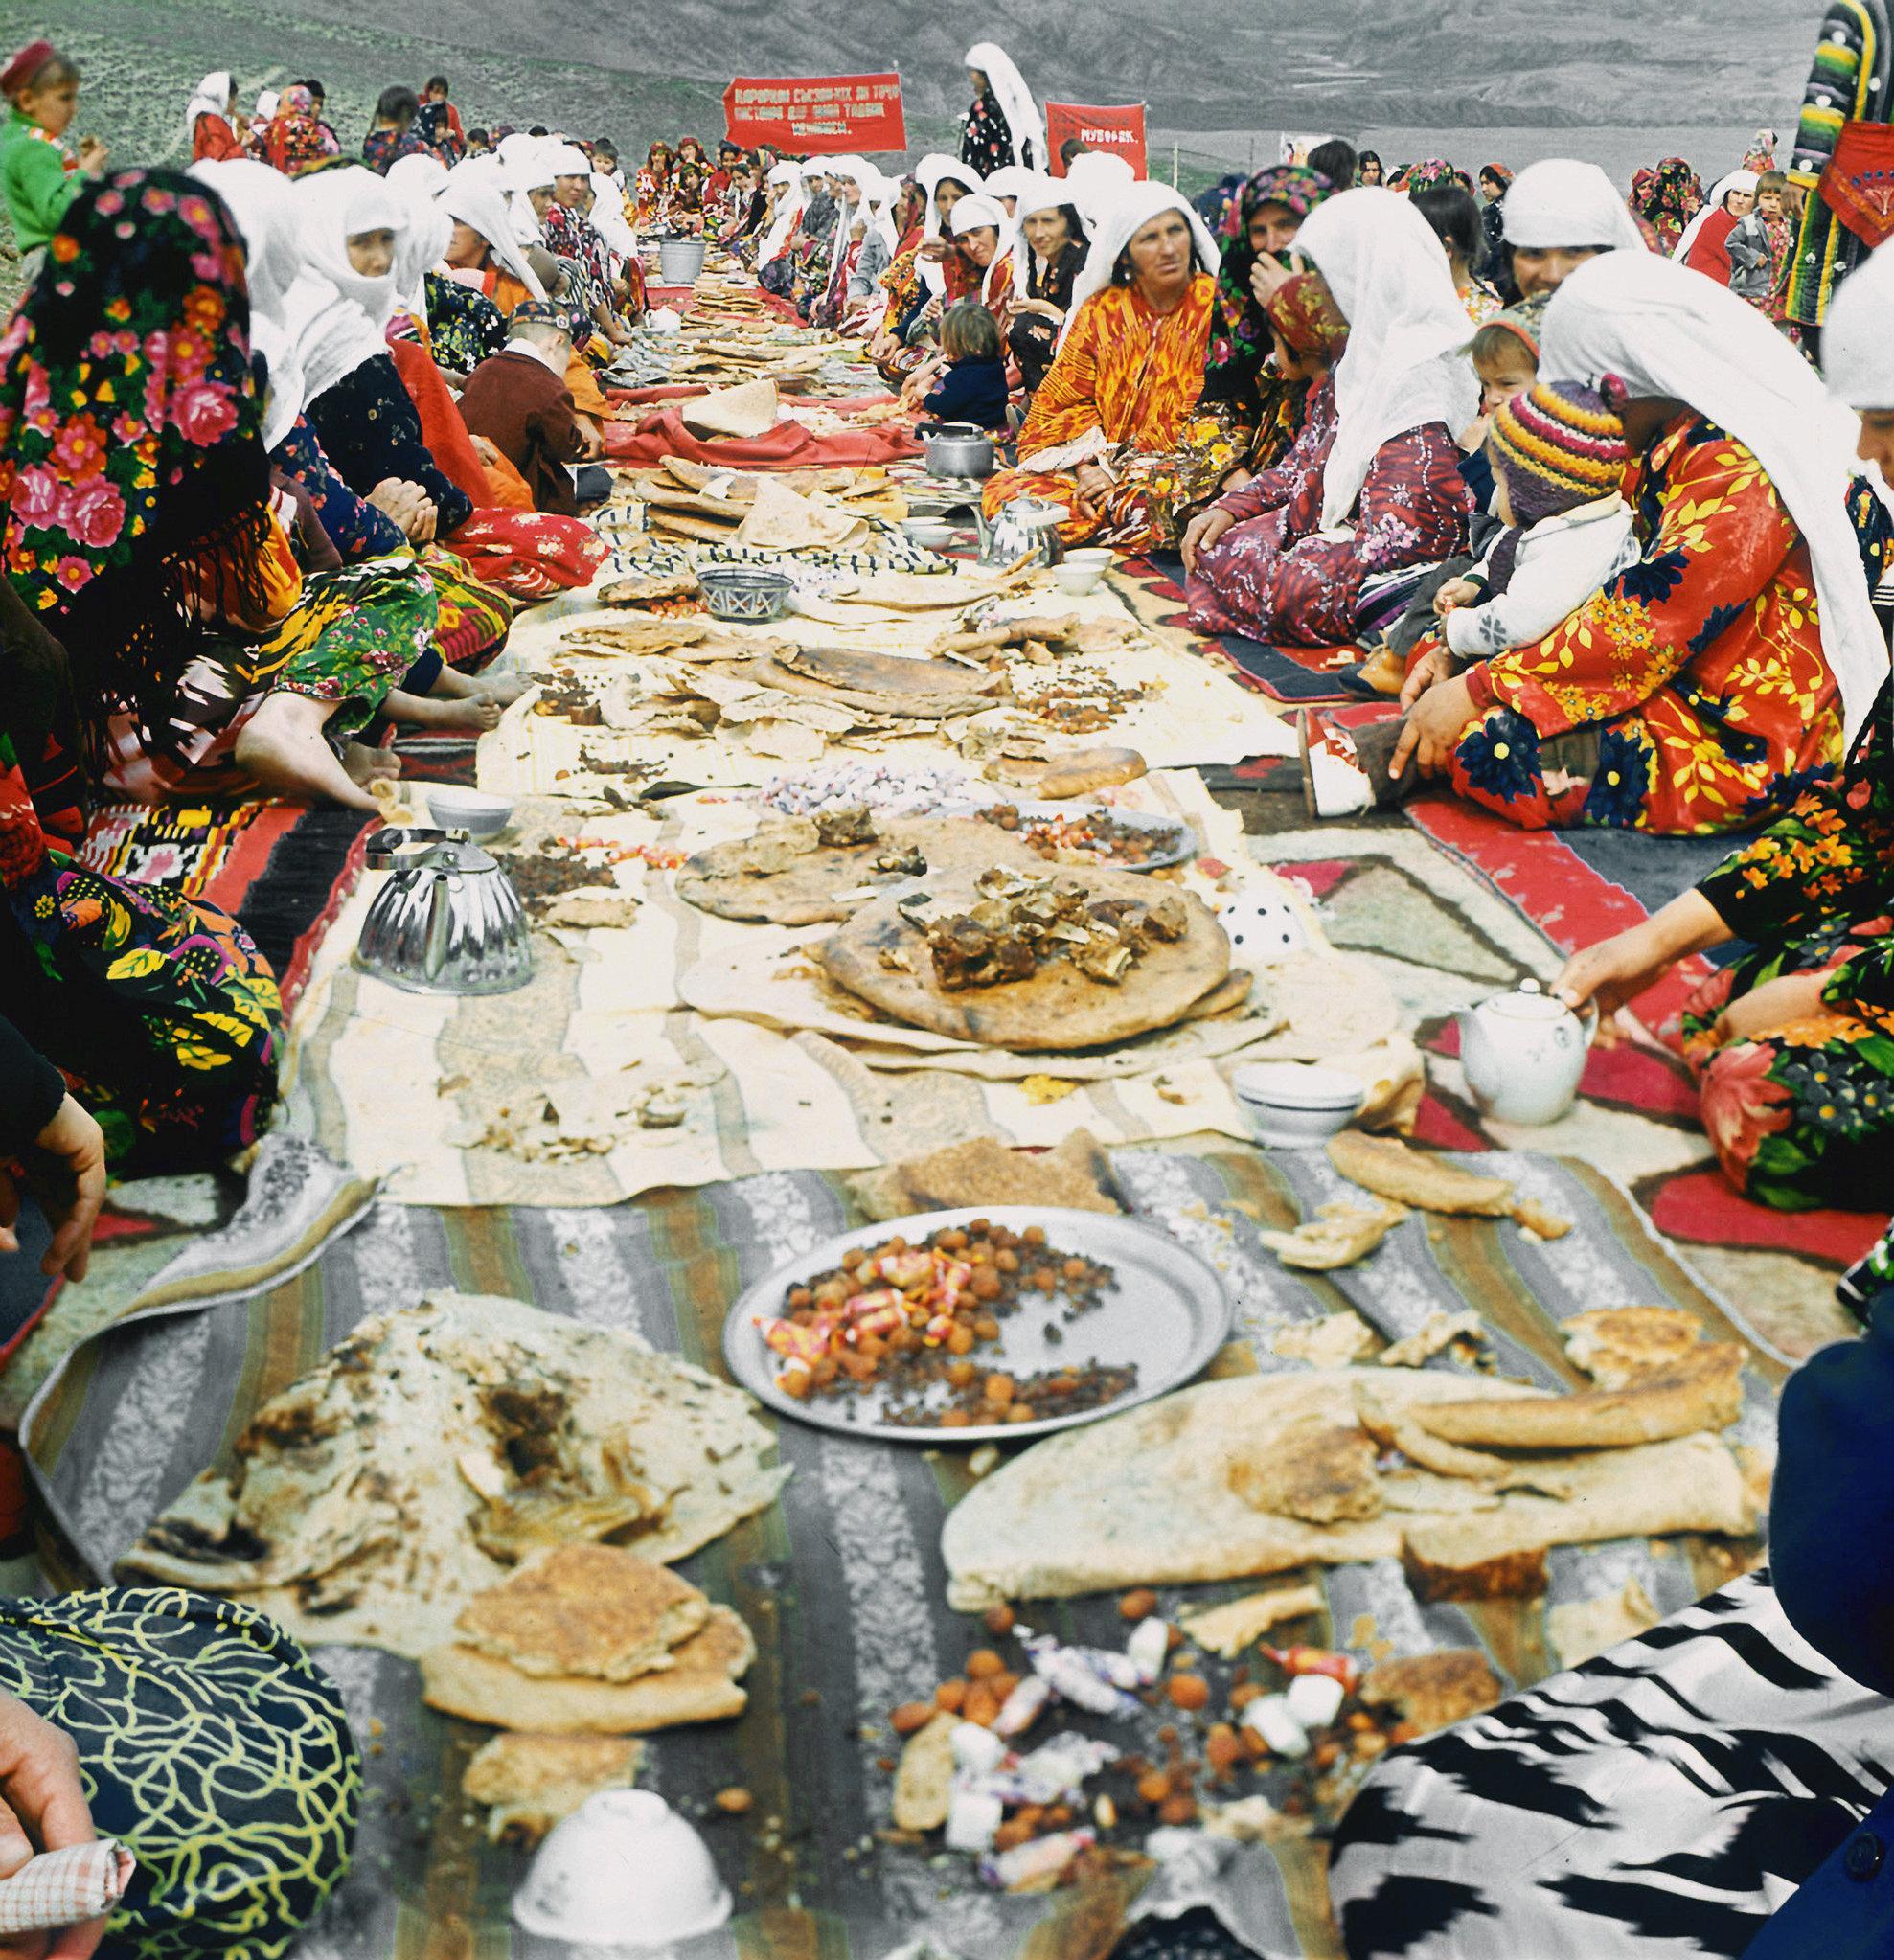 Празднование праздника Навруз в таджикском кишлаке